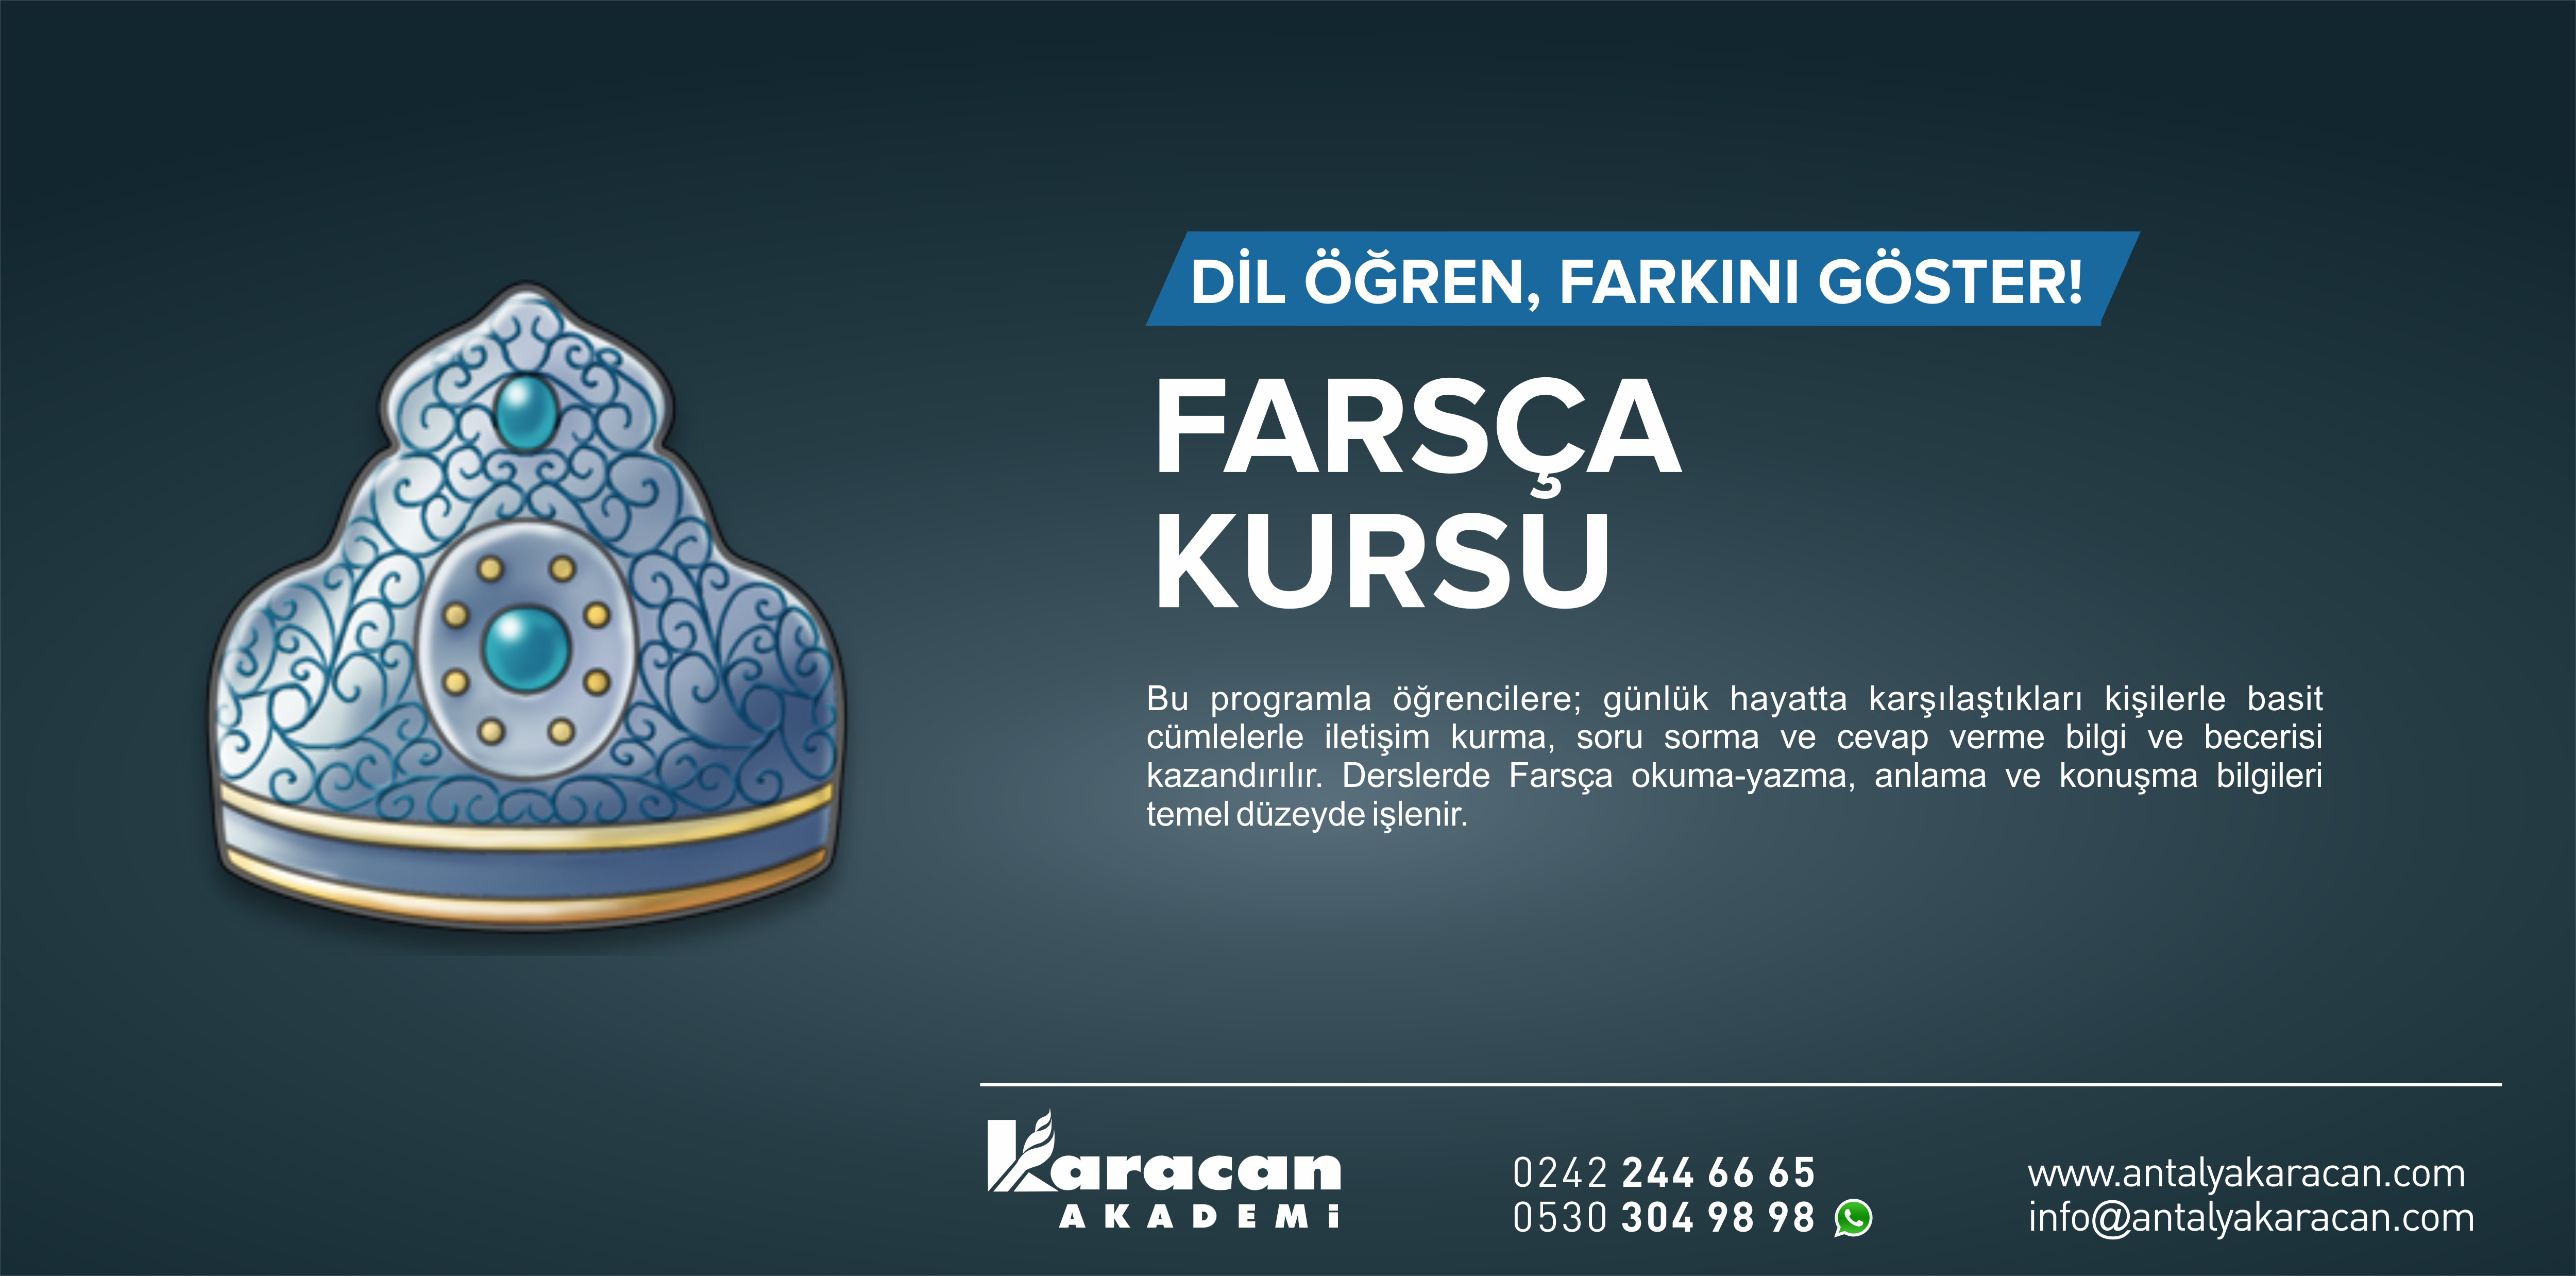 Antalya Farsca Kursu